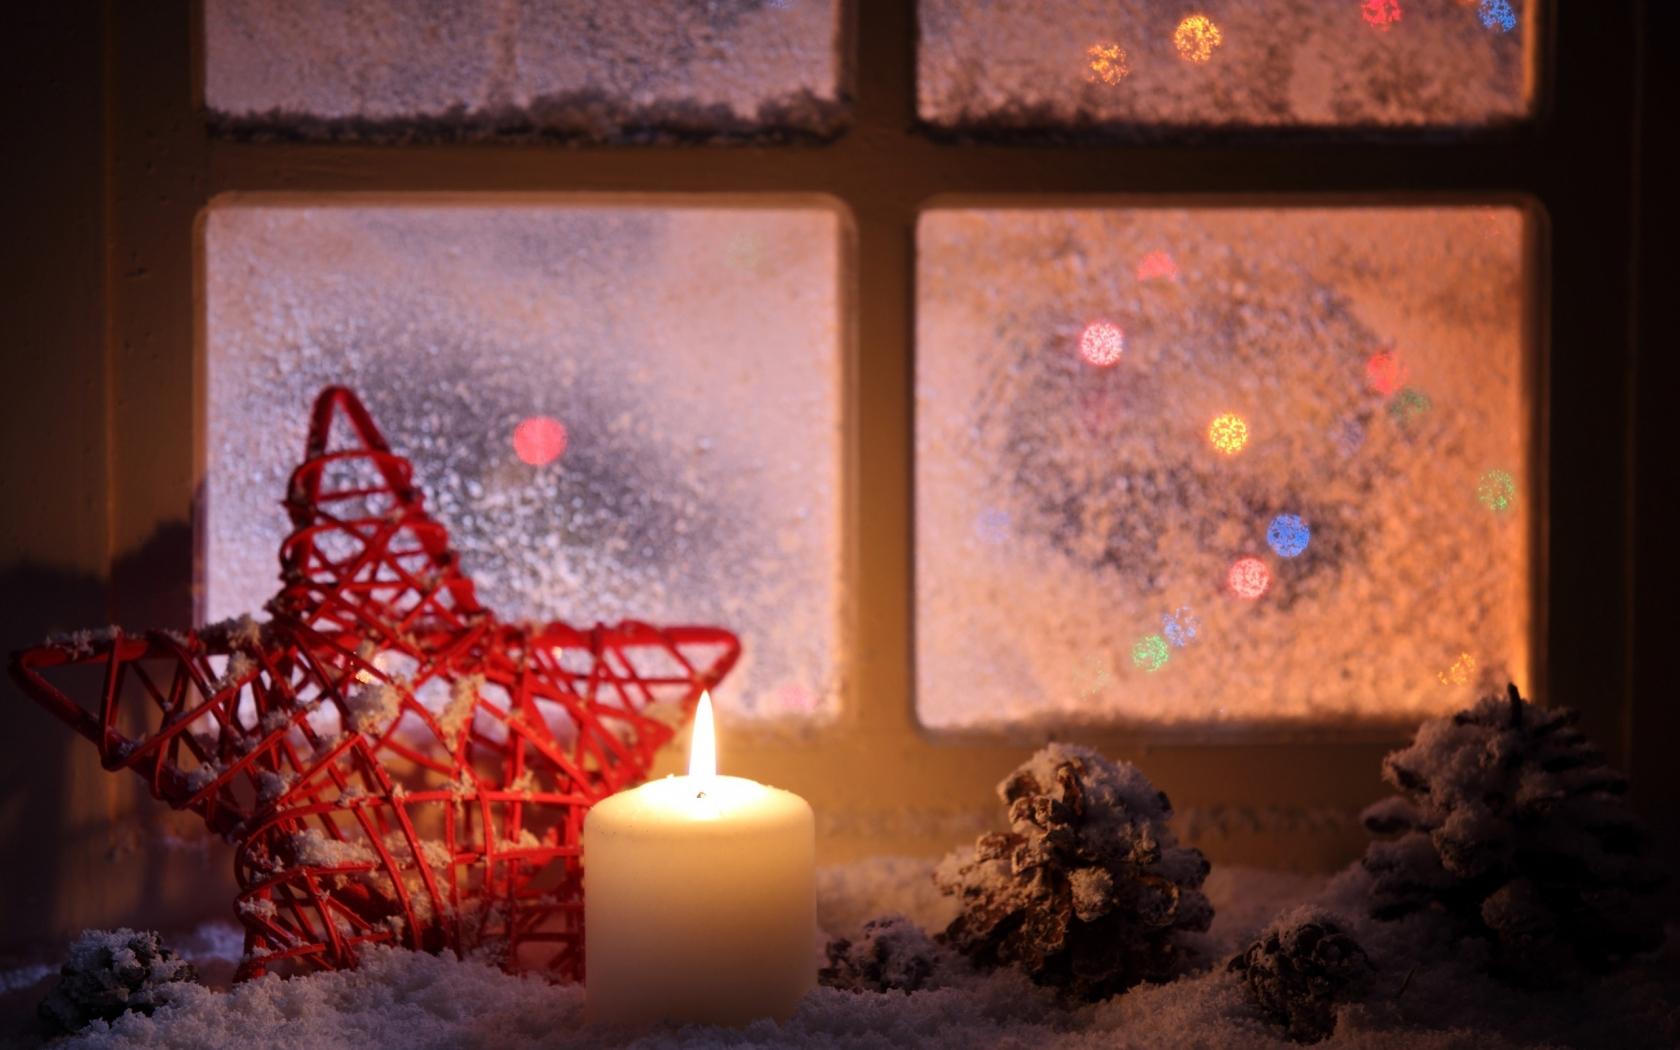 Vela junto a la ventana en navidad - 1680x1050